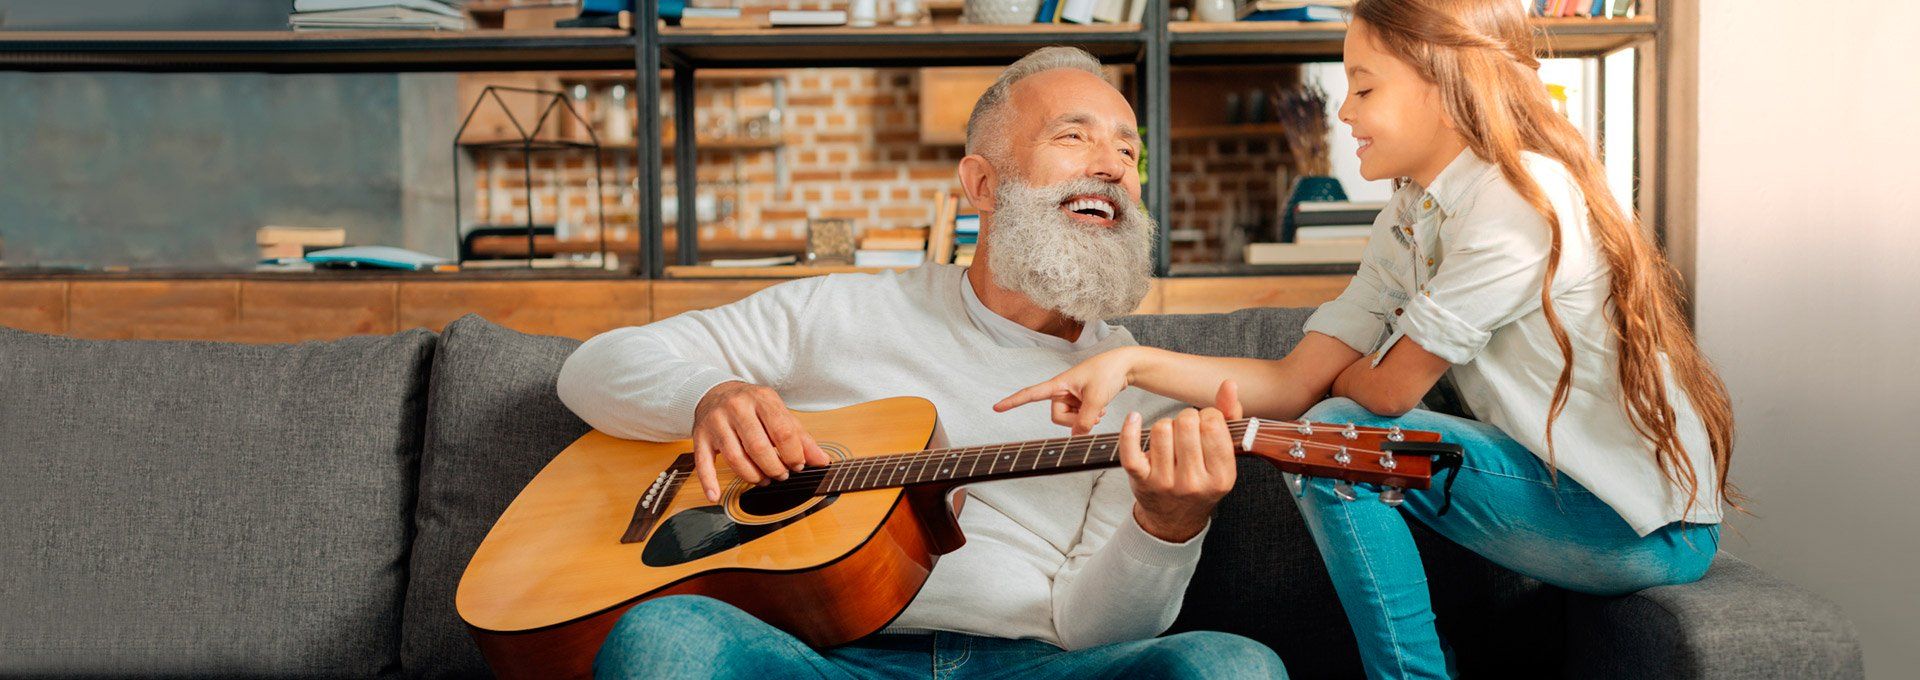 nonno-chitarra-introbanner